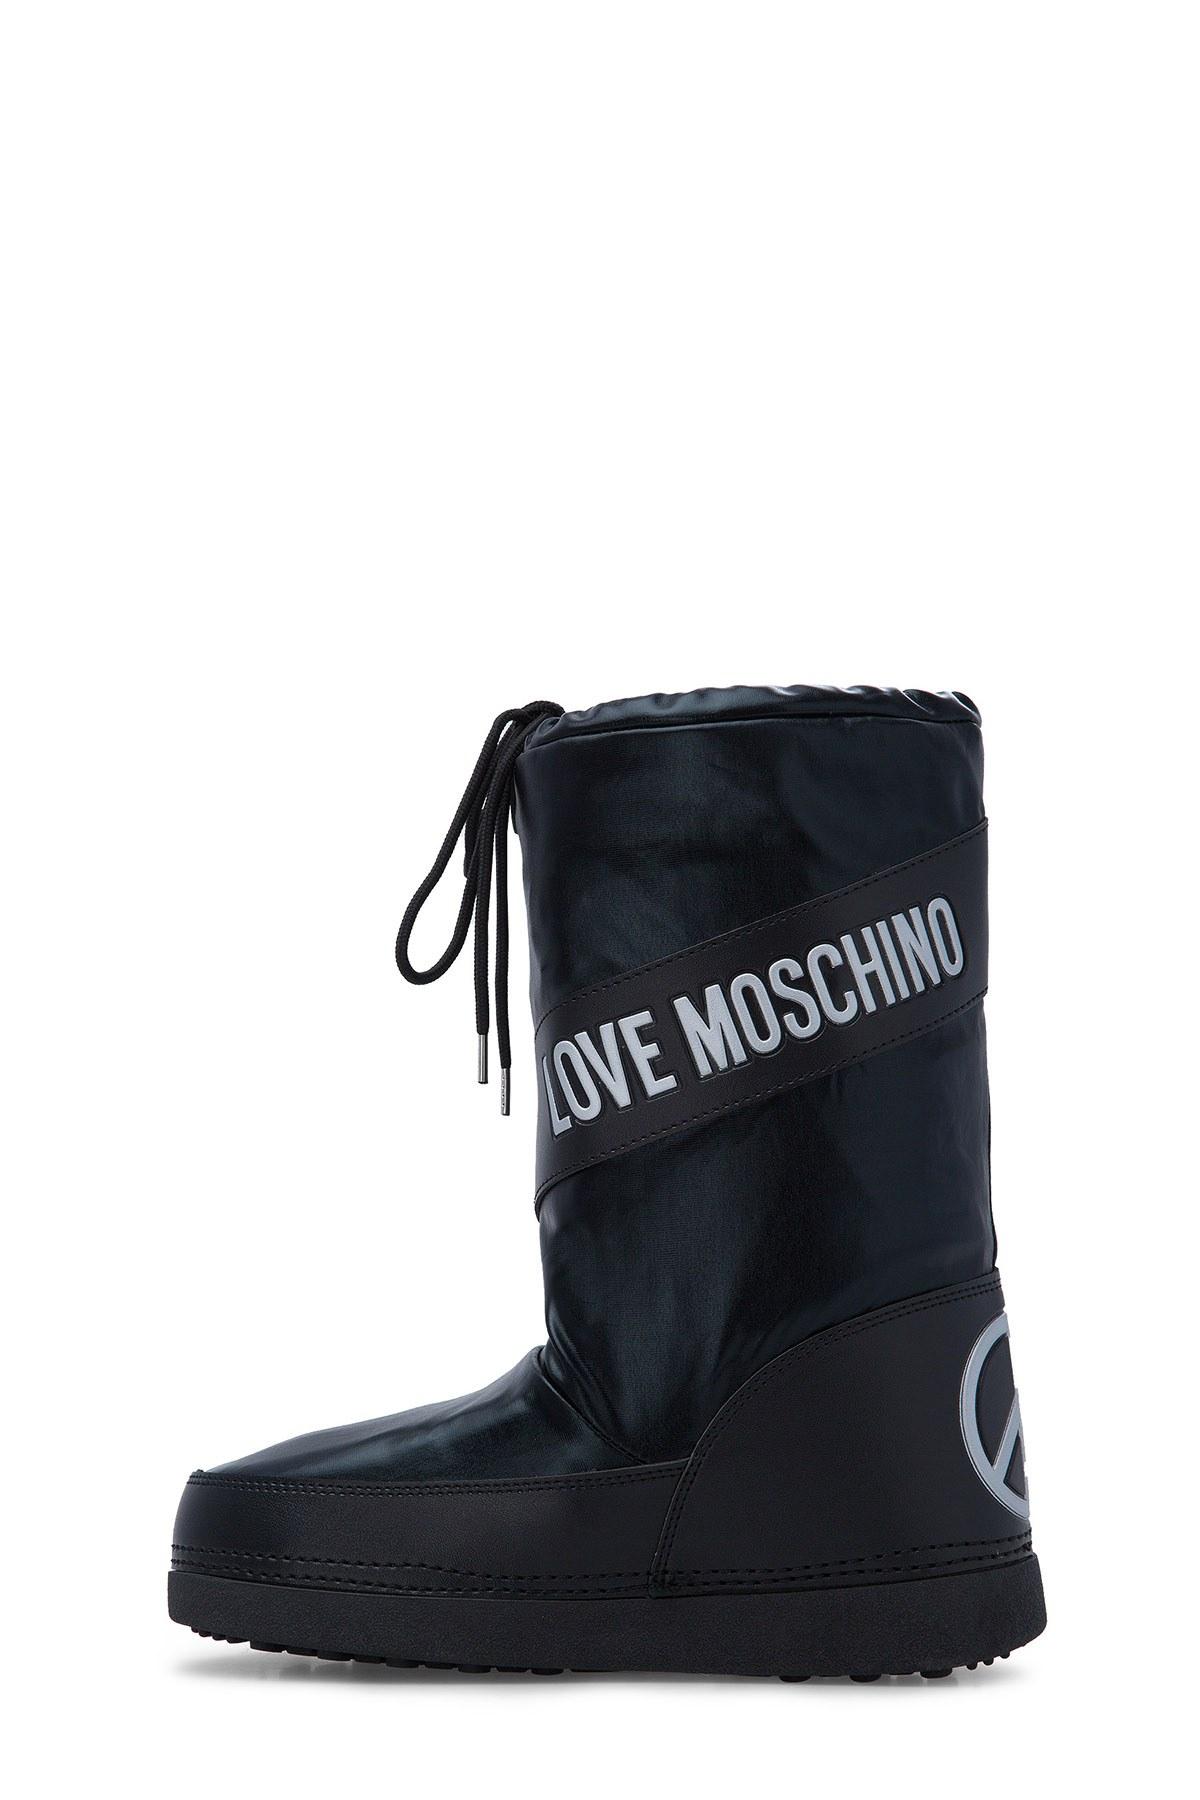 Love Moschino Kadın Kar Botu JA24012G18IJ0000 SİYAH